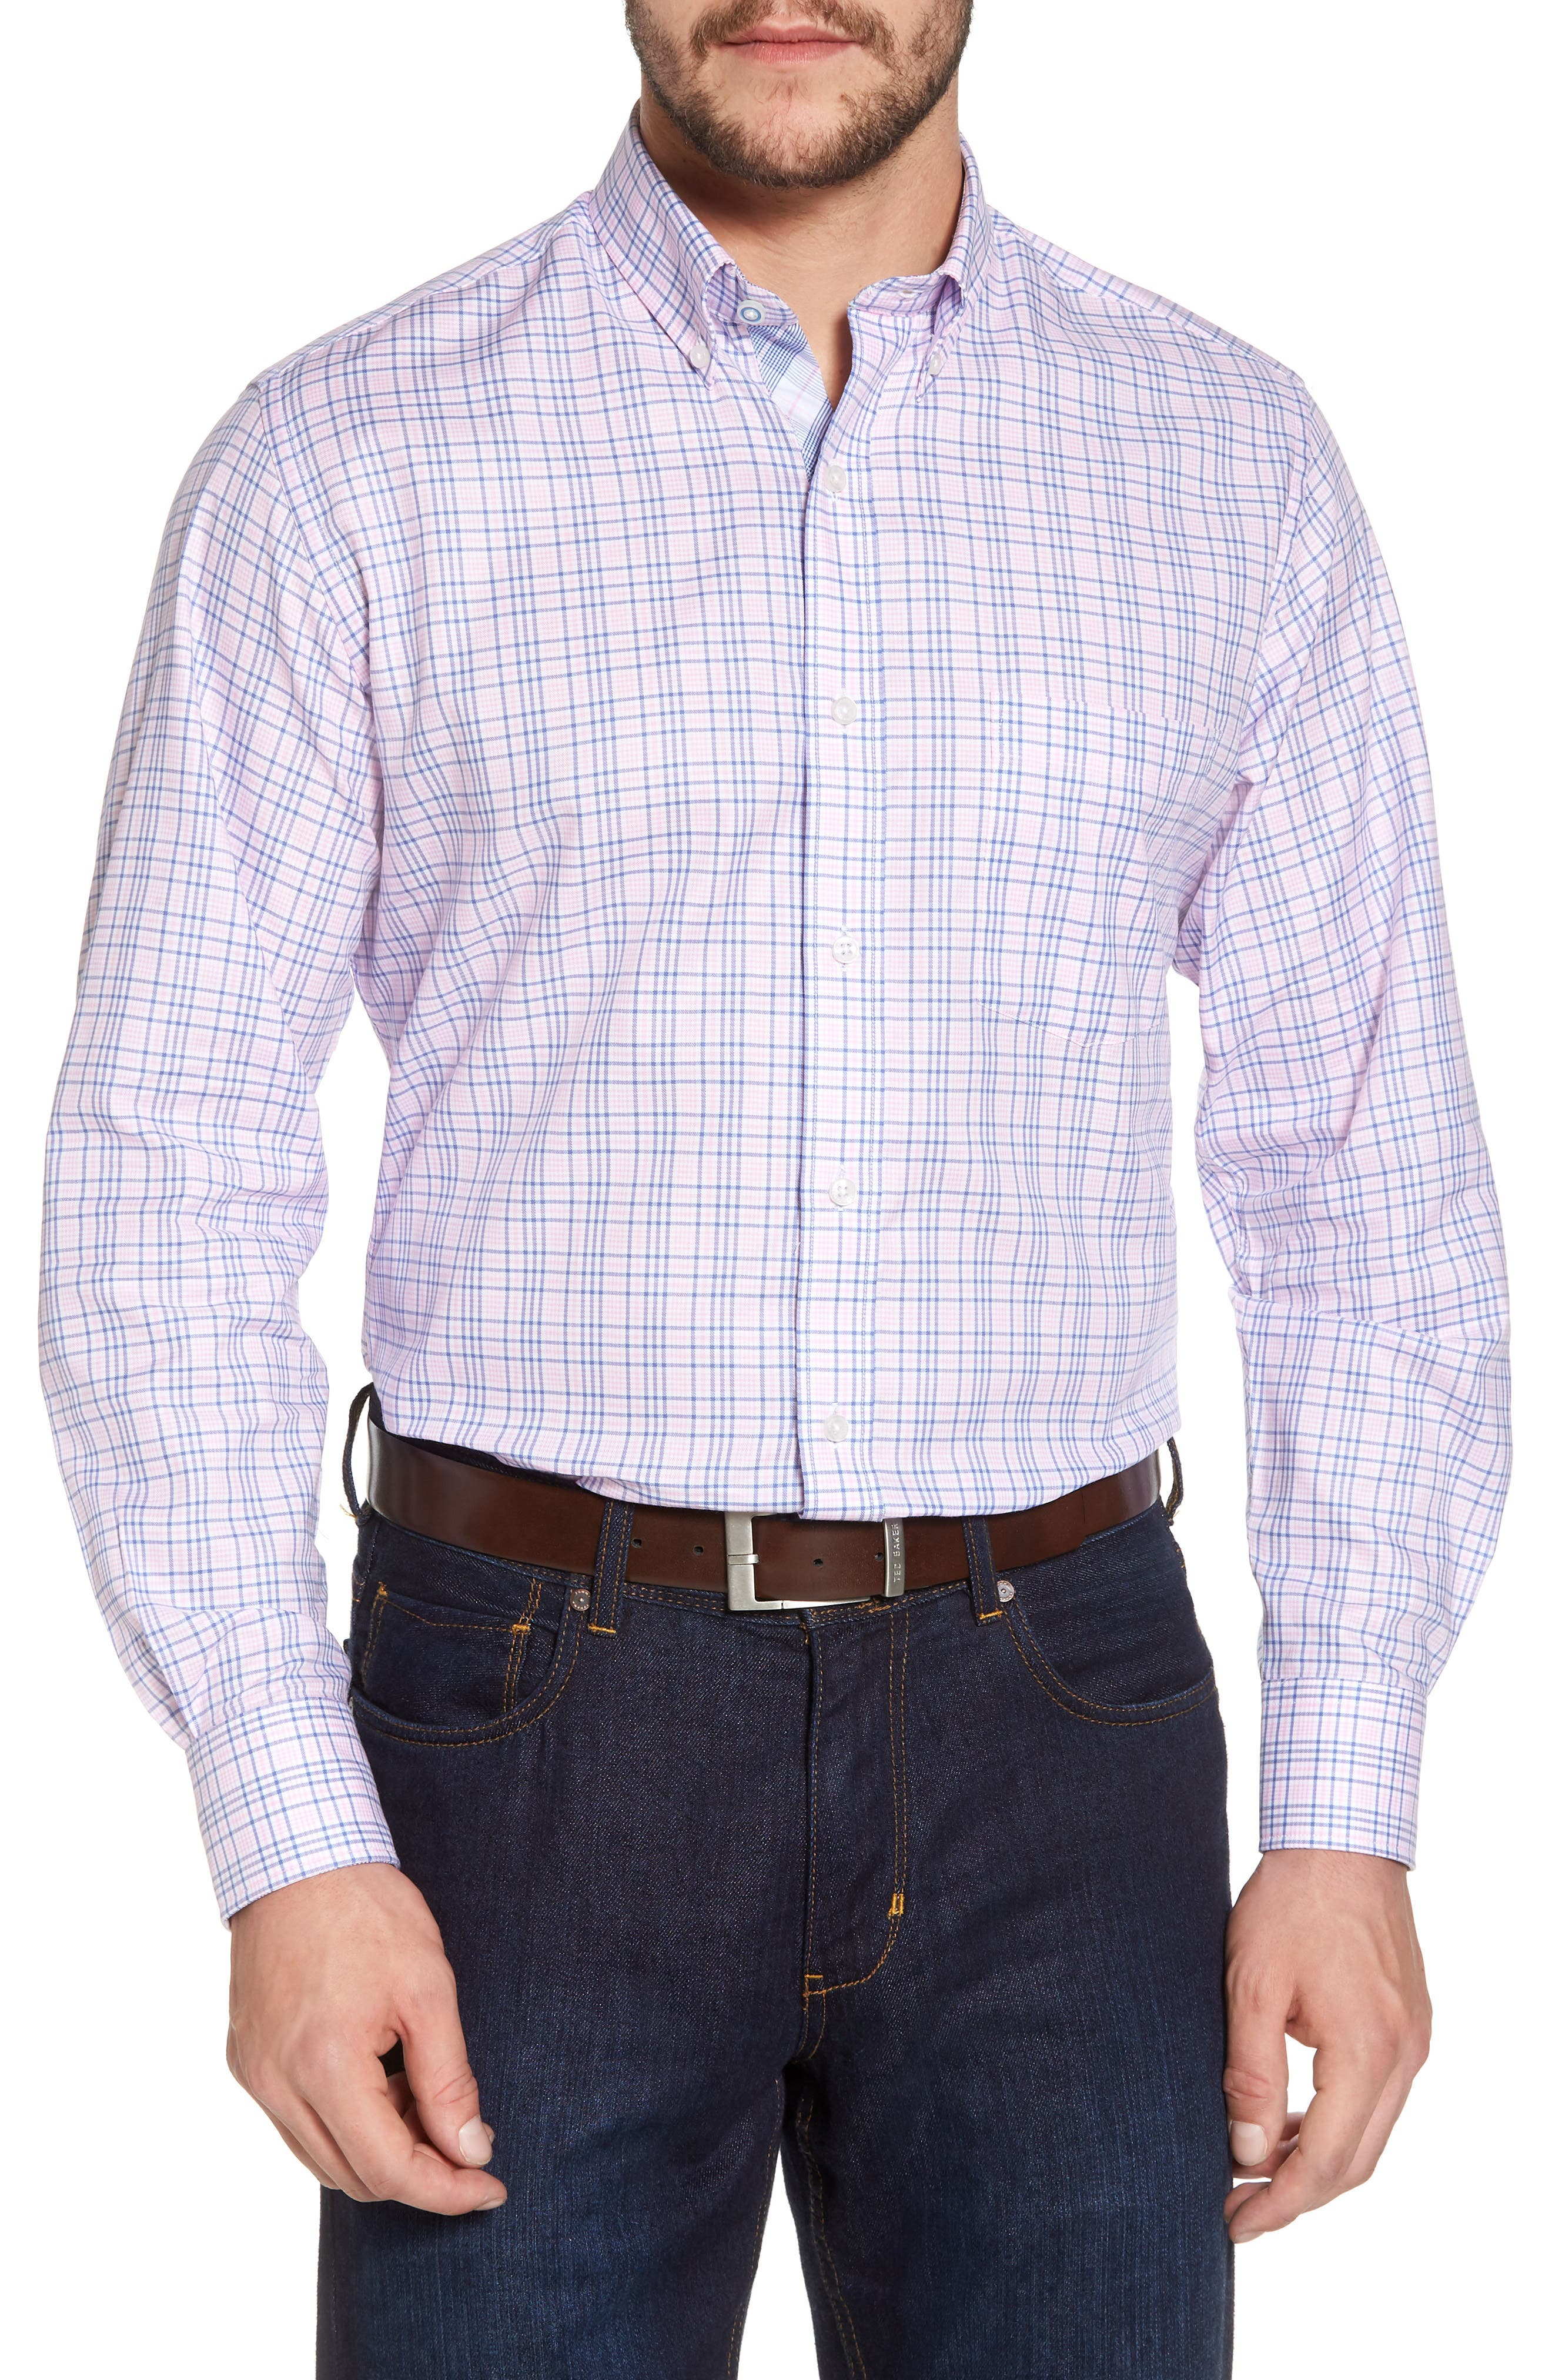 Barry Regular Fit Plaid Sport Shirt,                             Main thumbnail 1, color,                             650